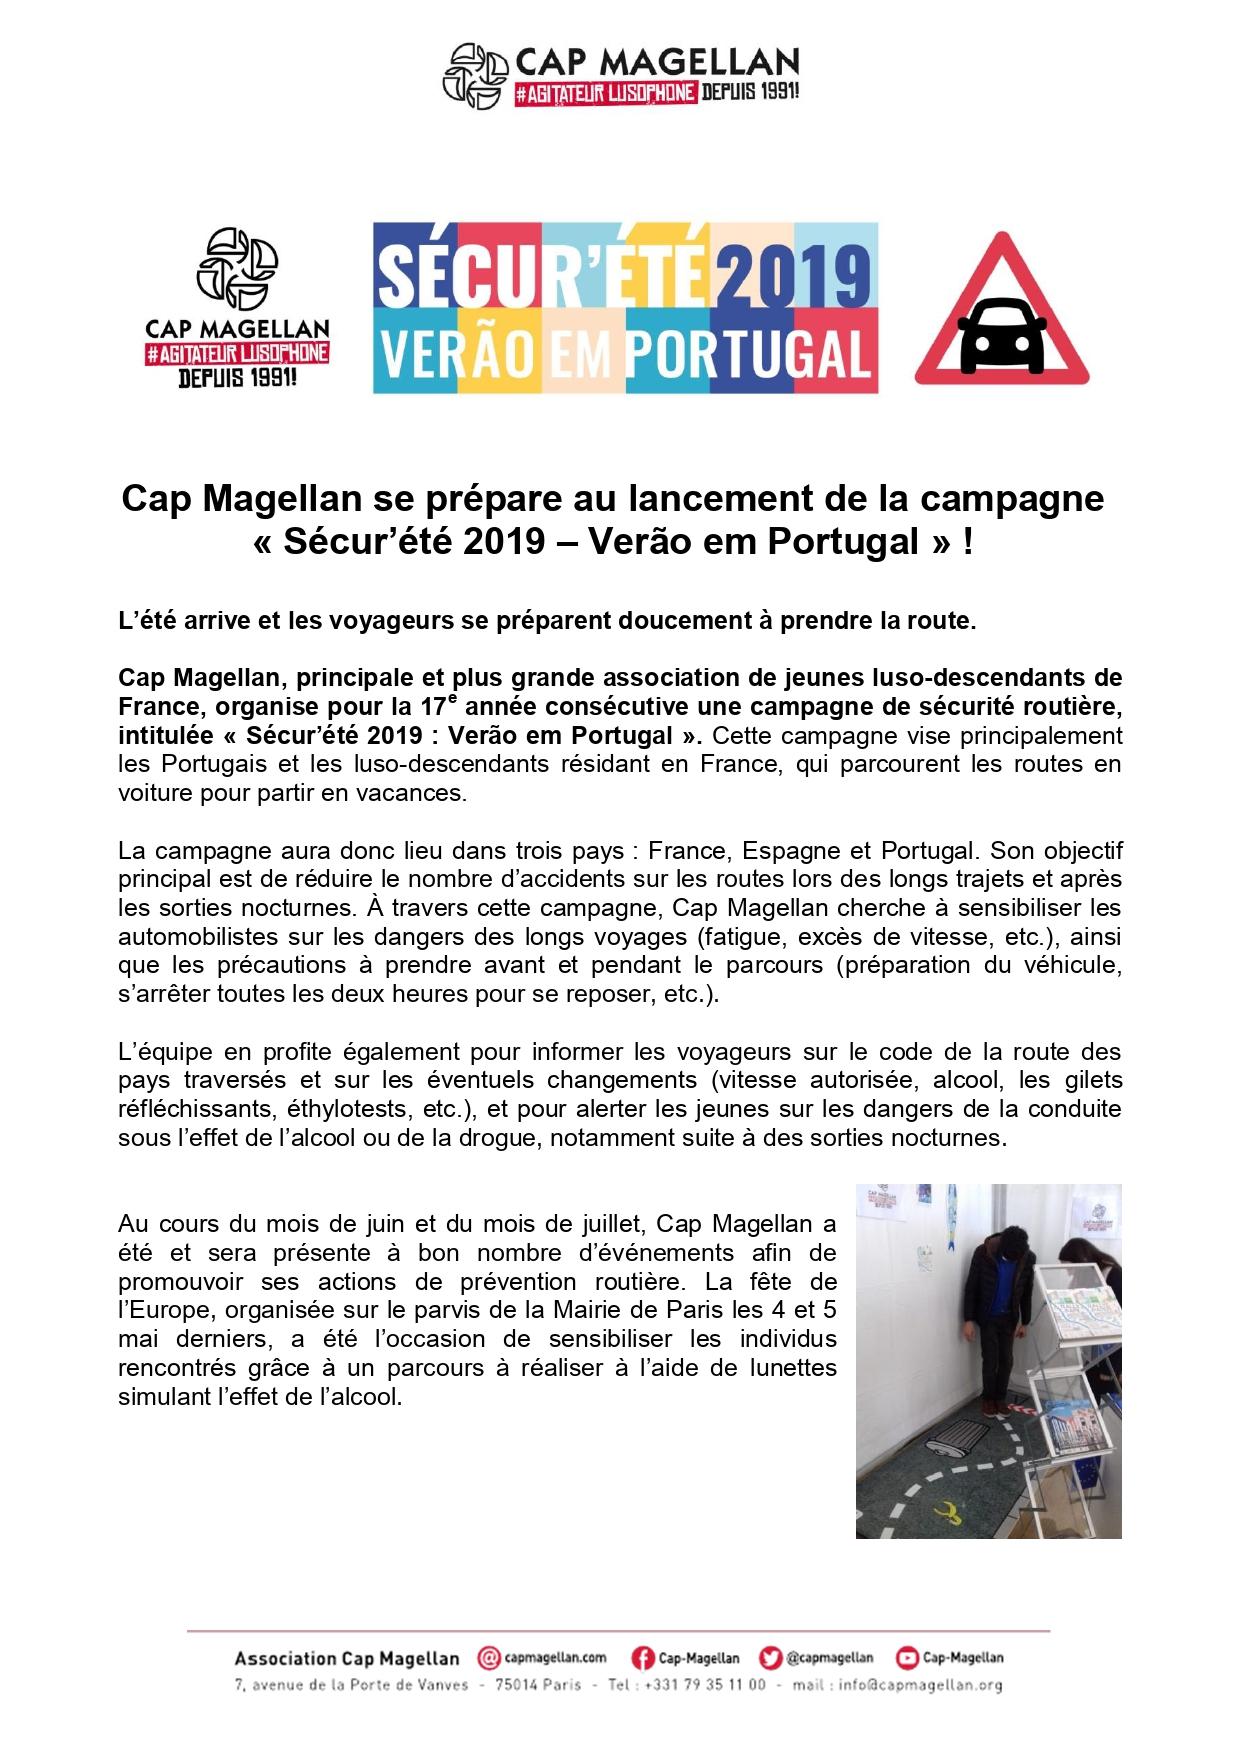 190607 Cap Magellan prevencao rodoviaria FR e PT_page-0001